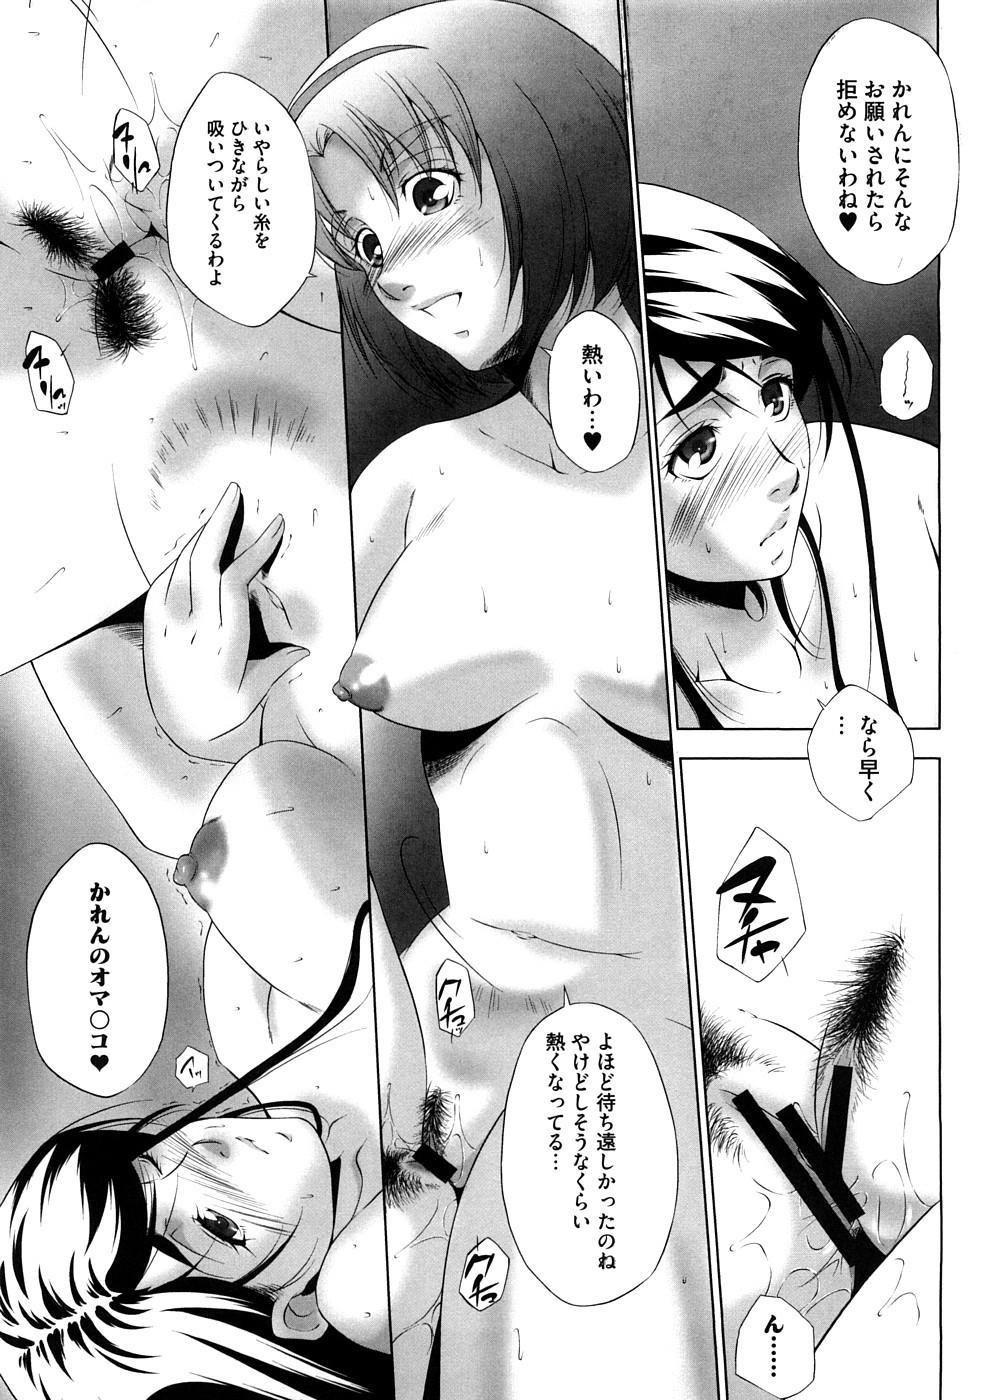 Cure Cure Ryoujoku Emaki Pre●ure EroParoAnthology 47